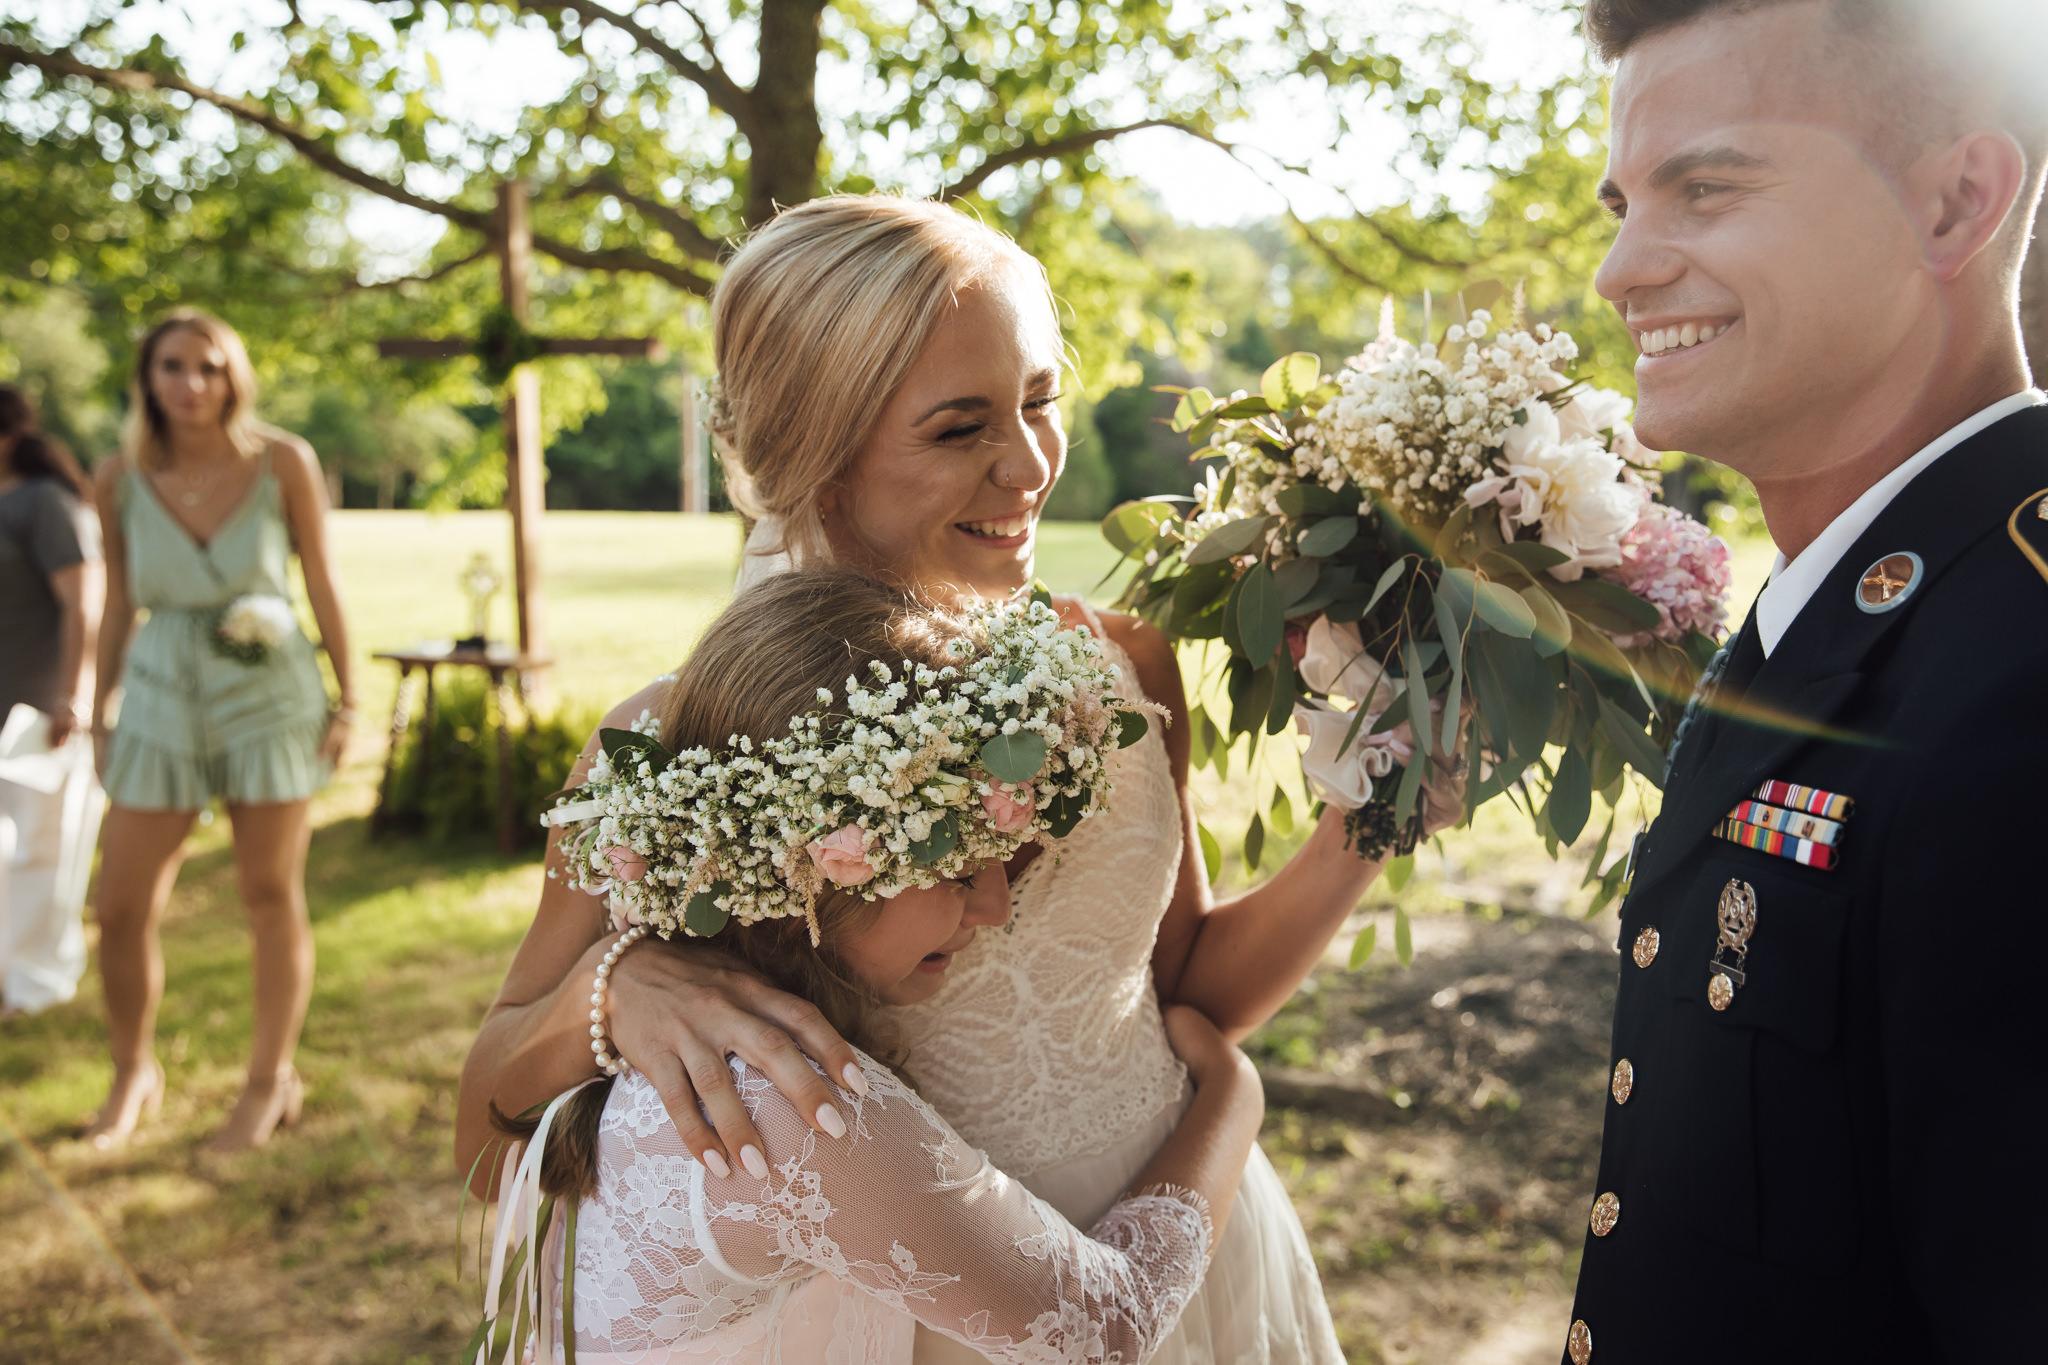 zbackyard-wedding-thewarmtharoundyou-lexy-branson-414.jpg